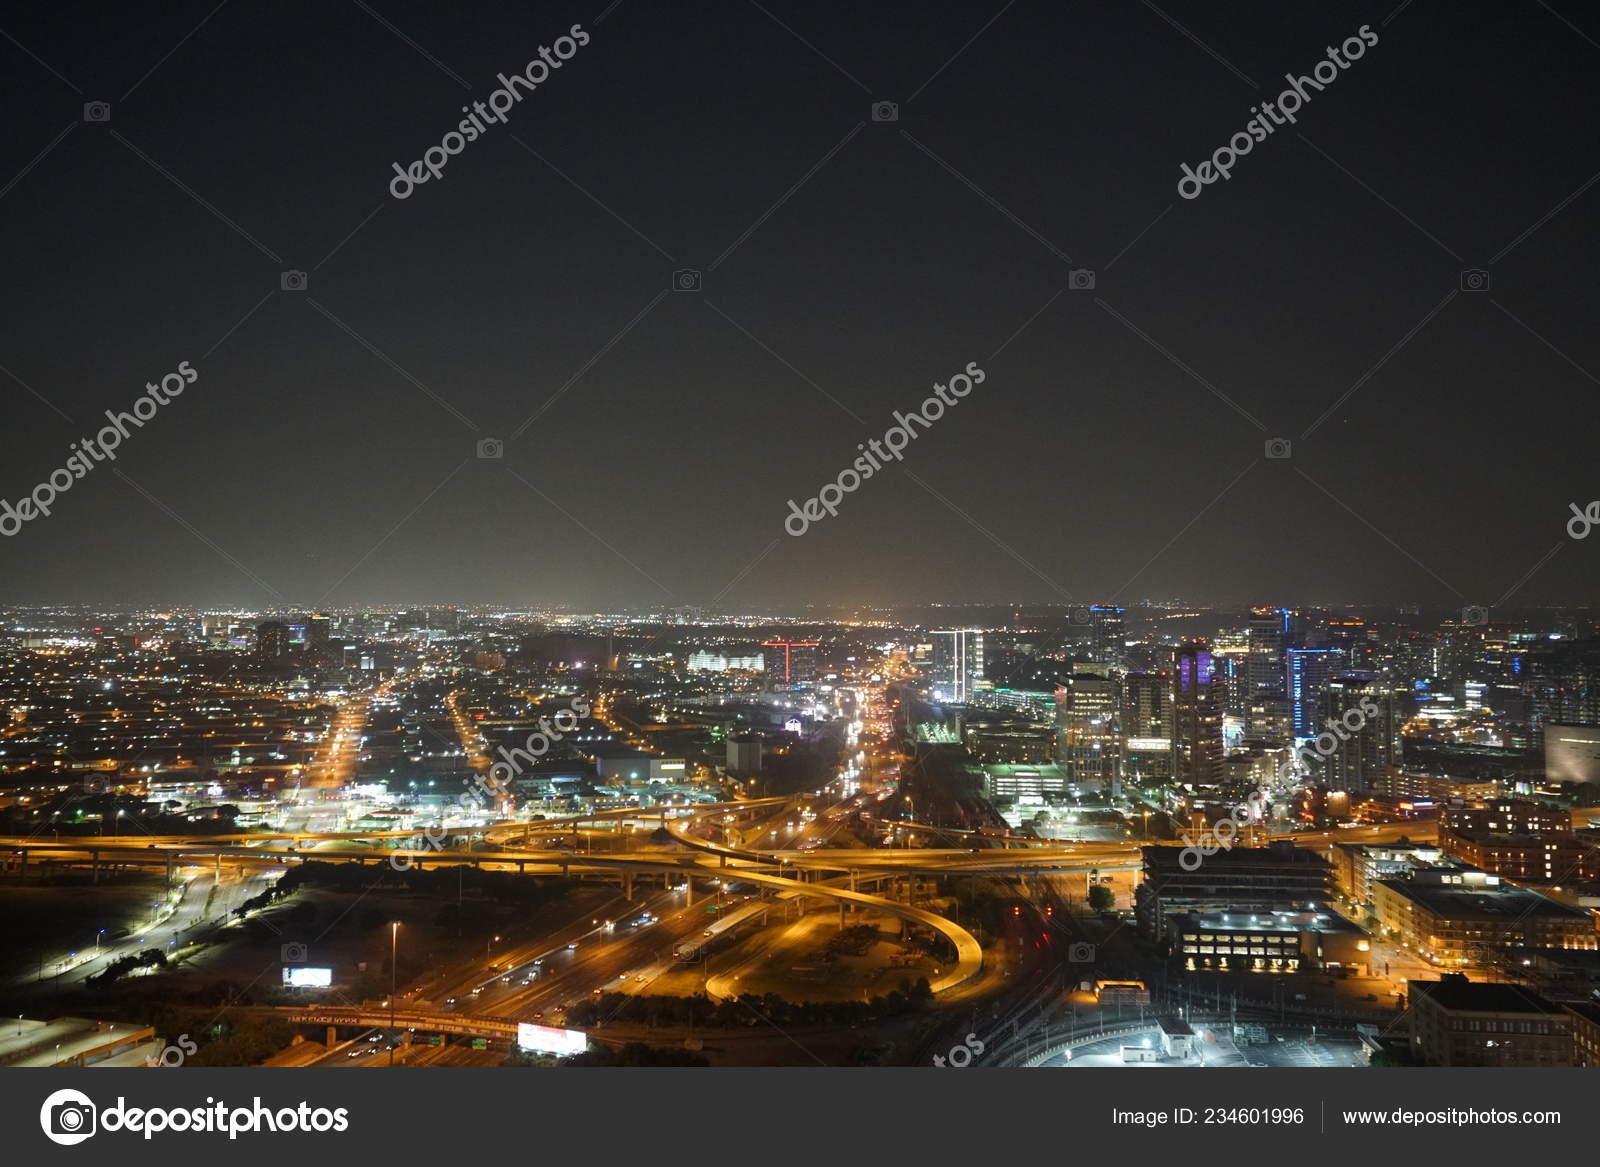 Vista Cidade Noturna Iluminada Trafego Rodoviario Stock Photo C Nicholasgeraldinephotography 234601996